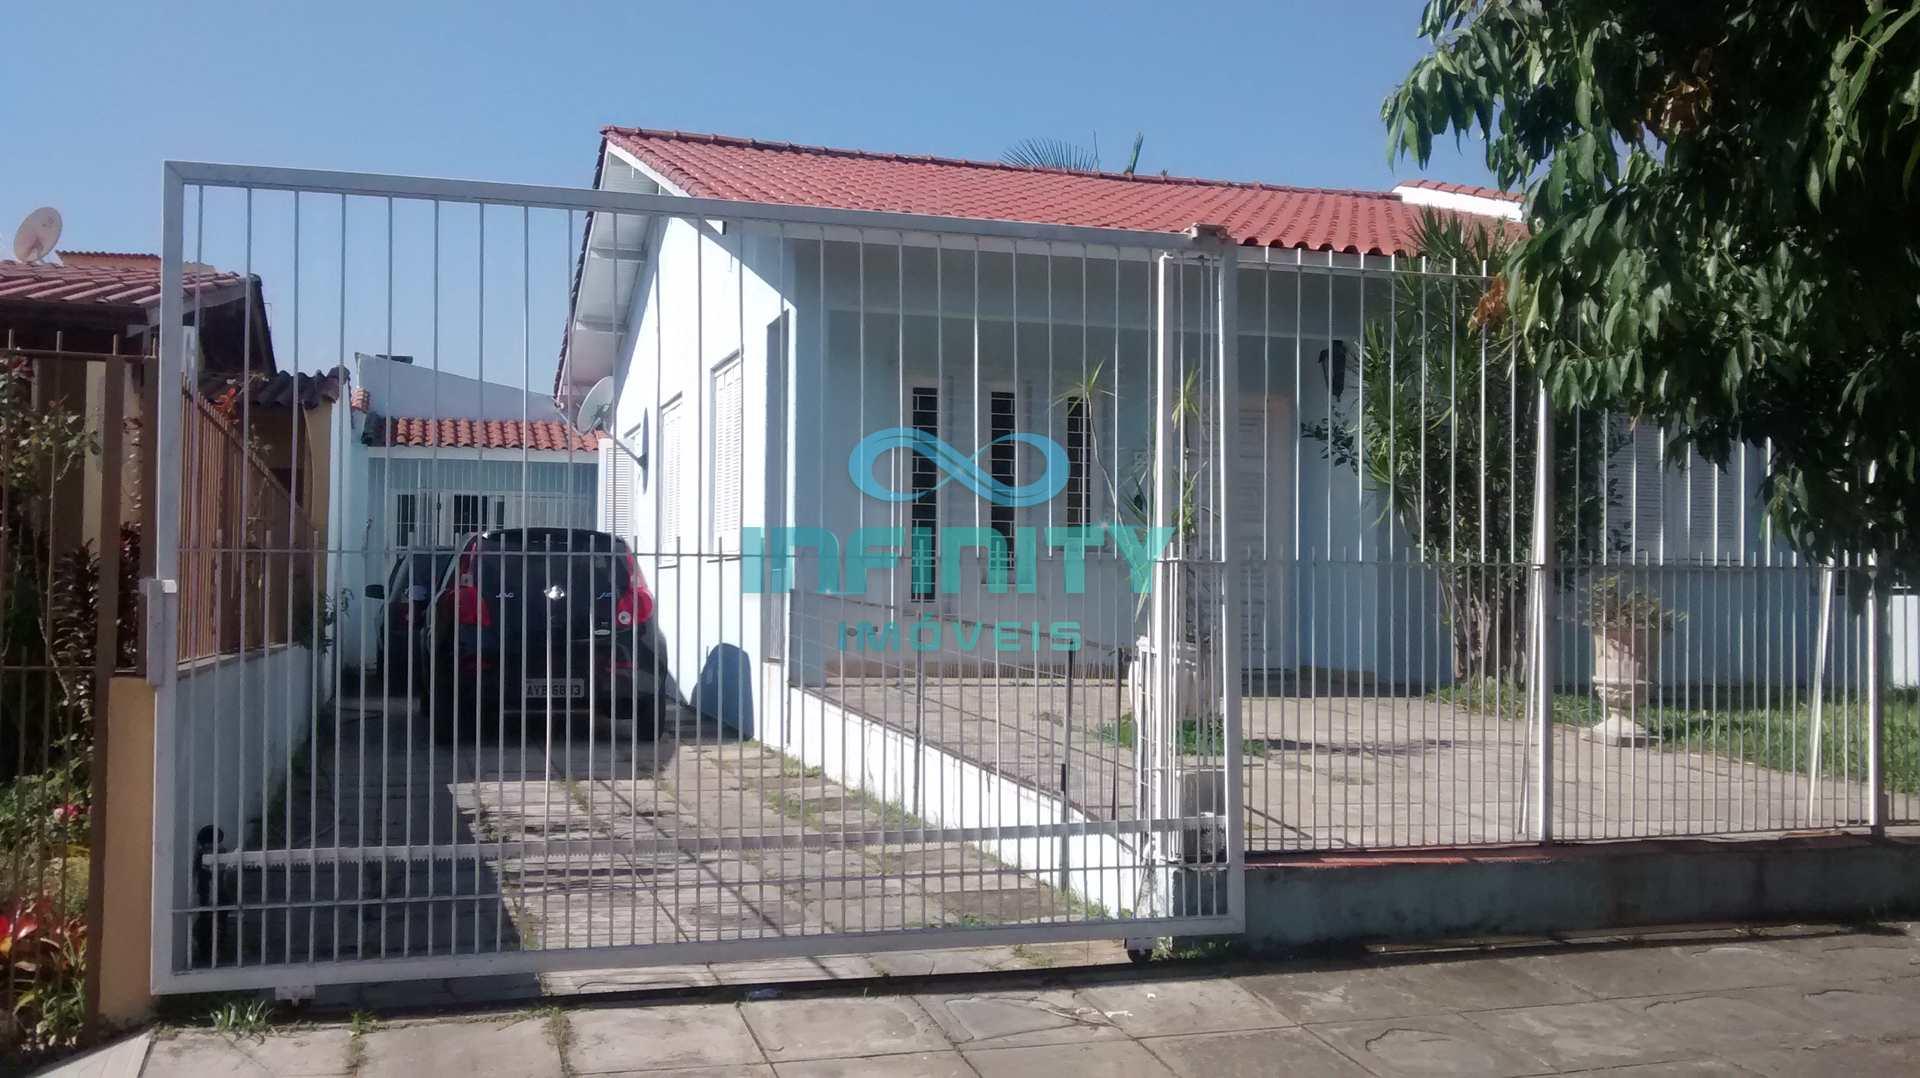 Casa com 3 dorms, Dom Feliciano, Gravataí - R$ 460 mil, Cod: 575